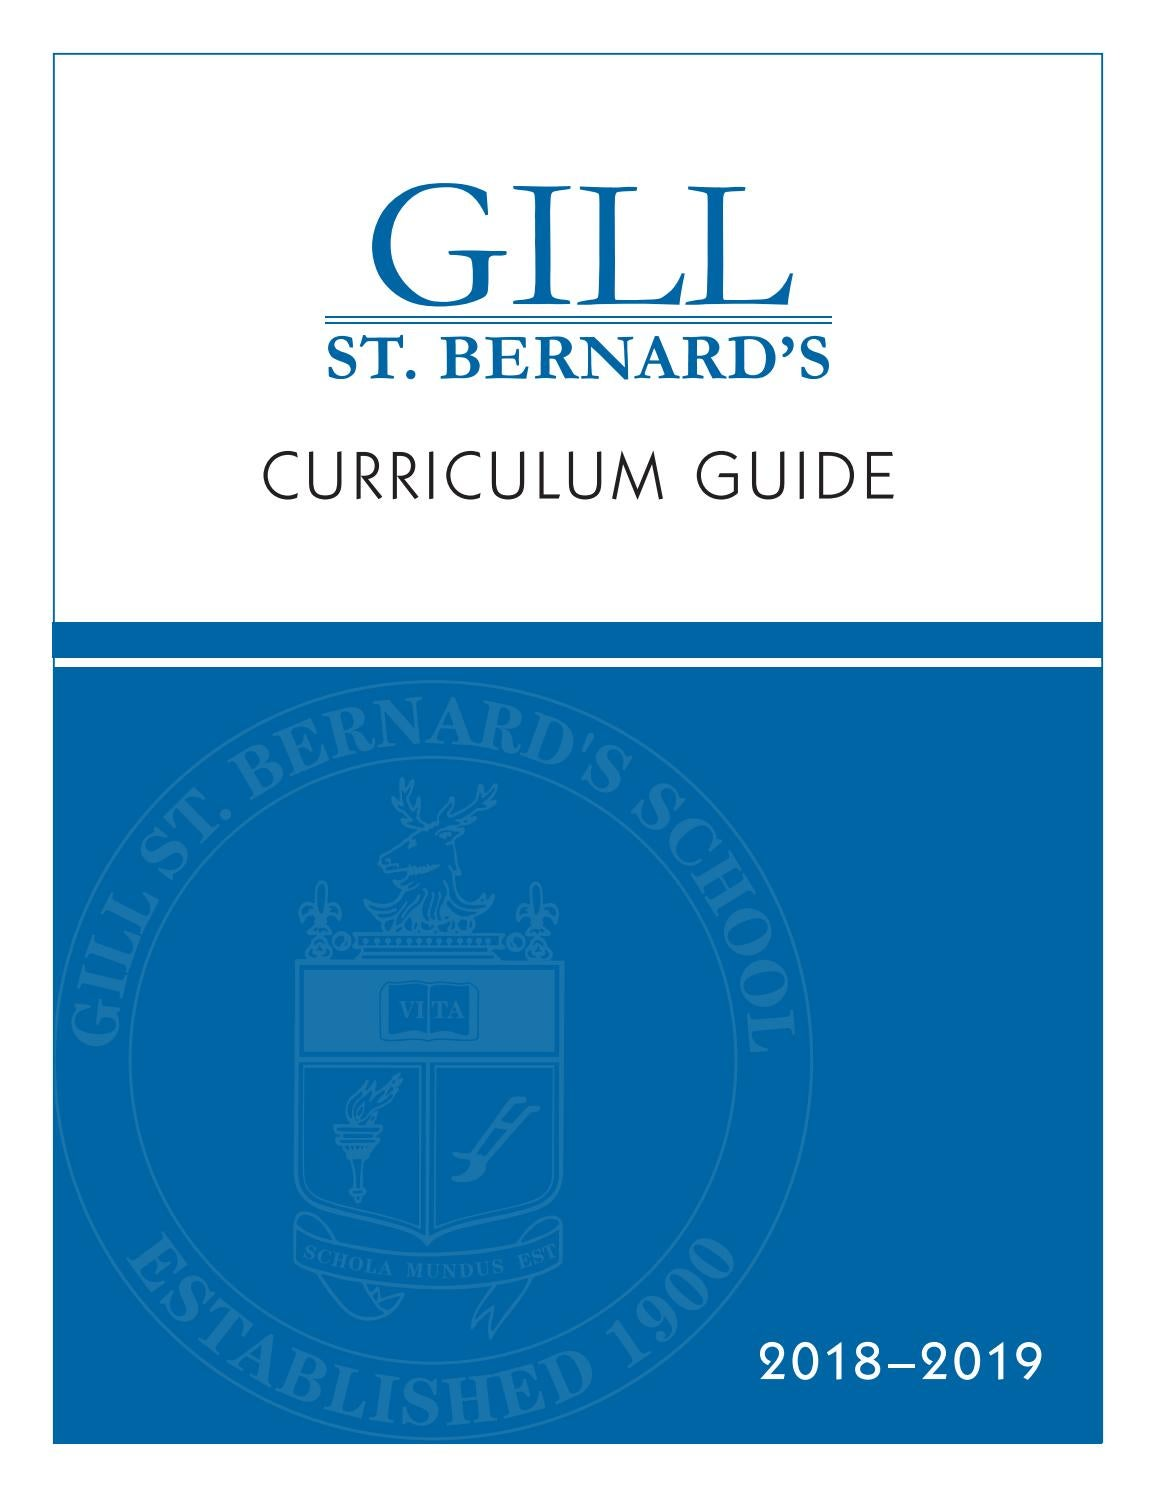 GSB Curriculum Guide 2018-2019 by Gill St. Bernard\'s School - issuu